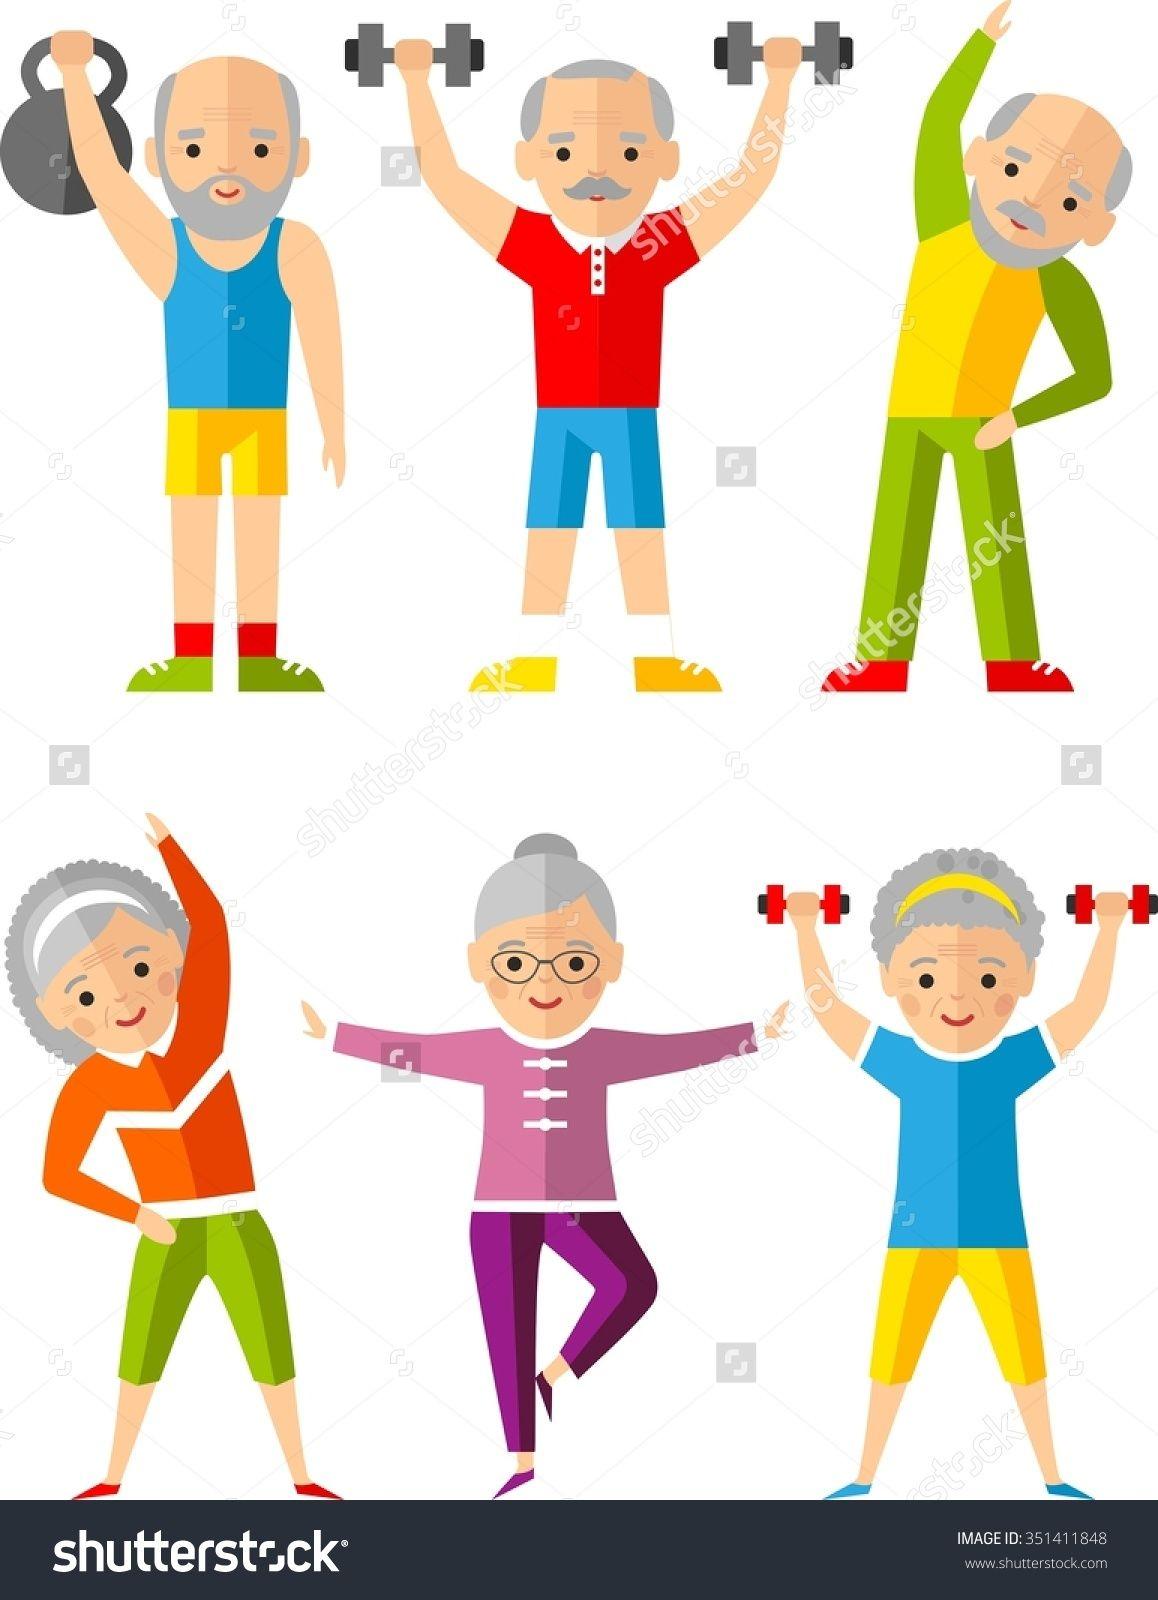 Exercising clipart elderly. Image result for free